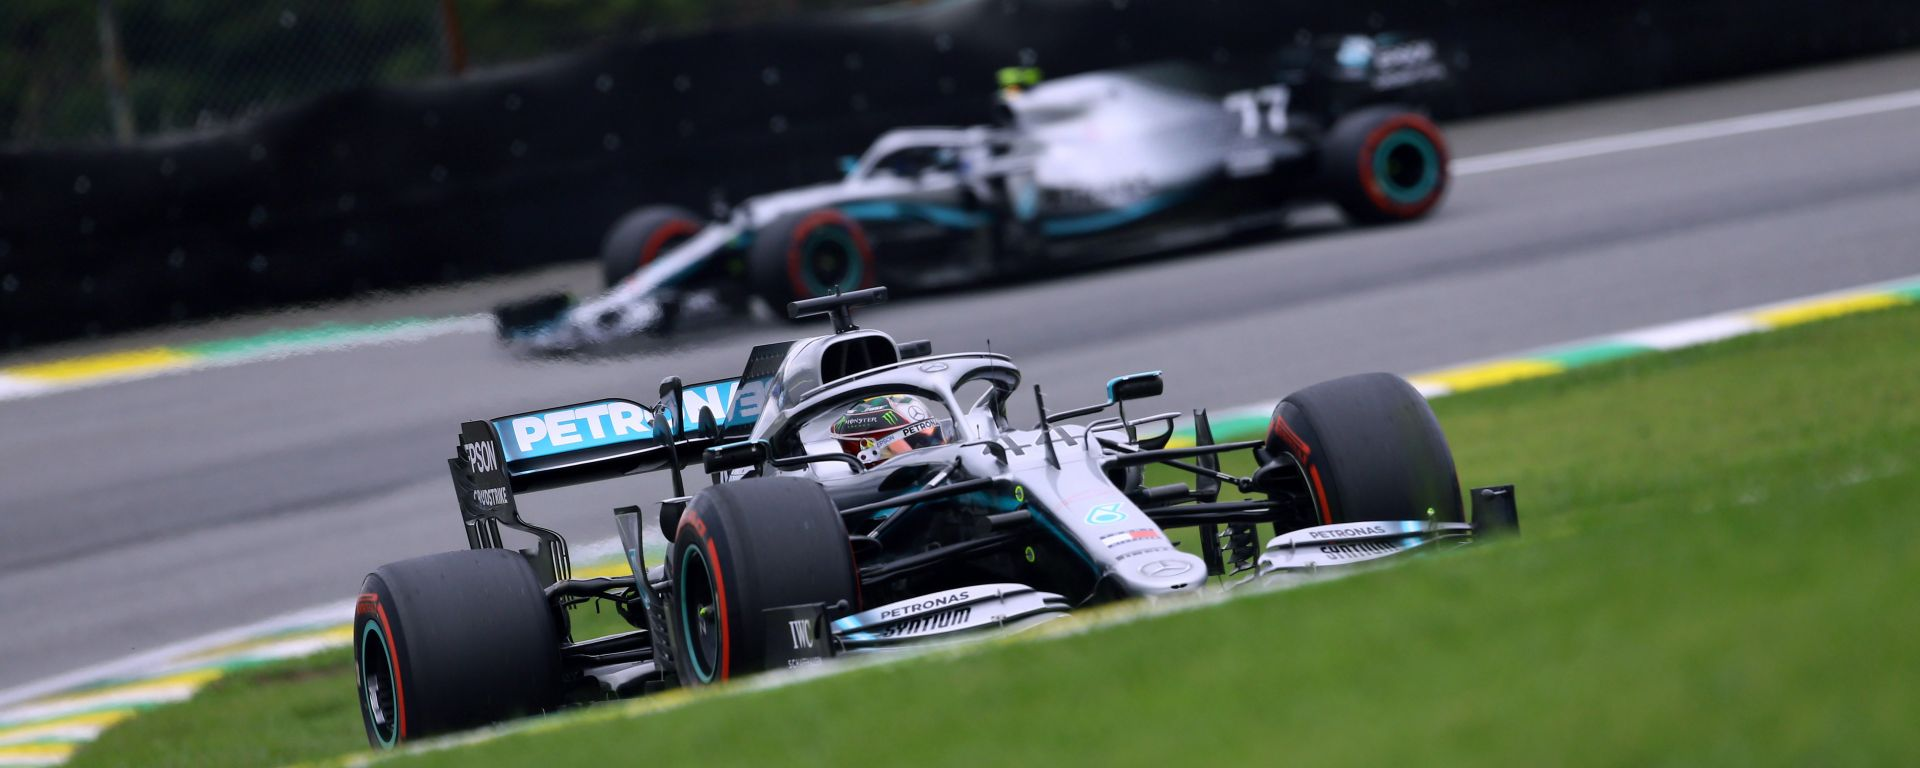 F1 GP Brasile 2019, Interlagos: Lewis Hamilton e Valtteri Bottas (Mercedes)